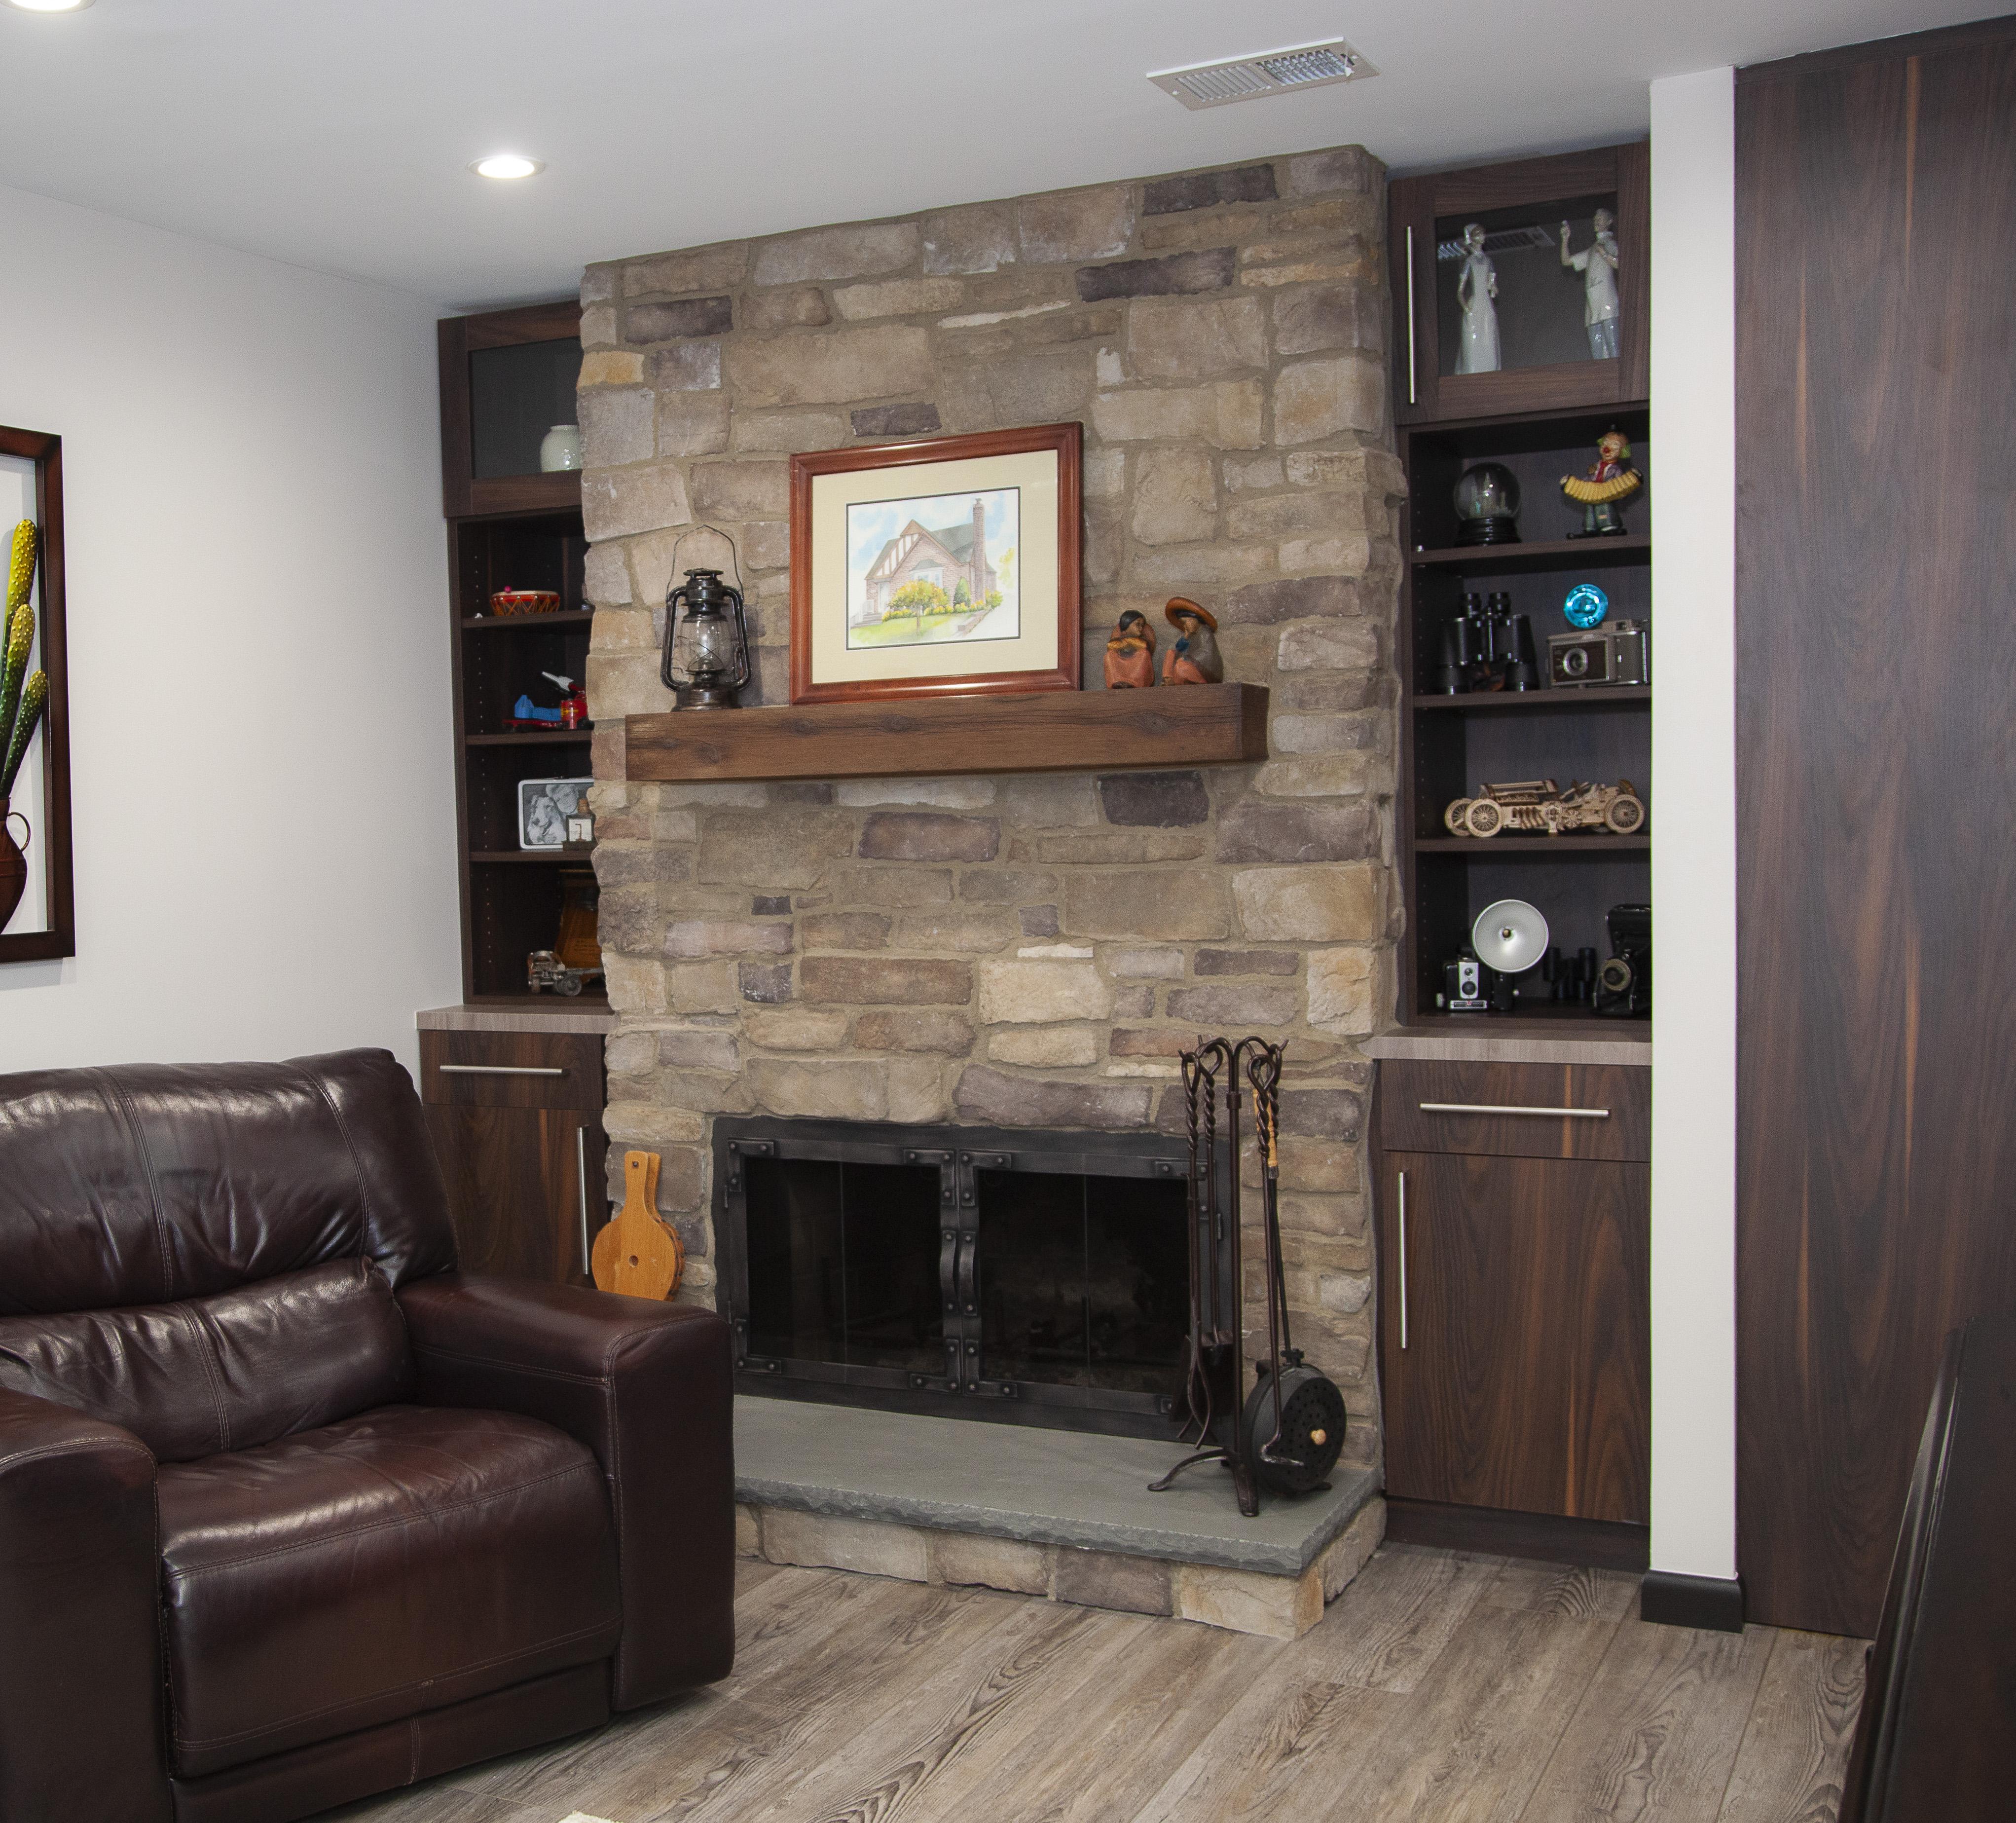 New Fireplace design